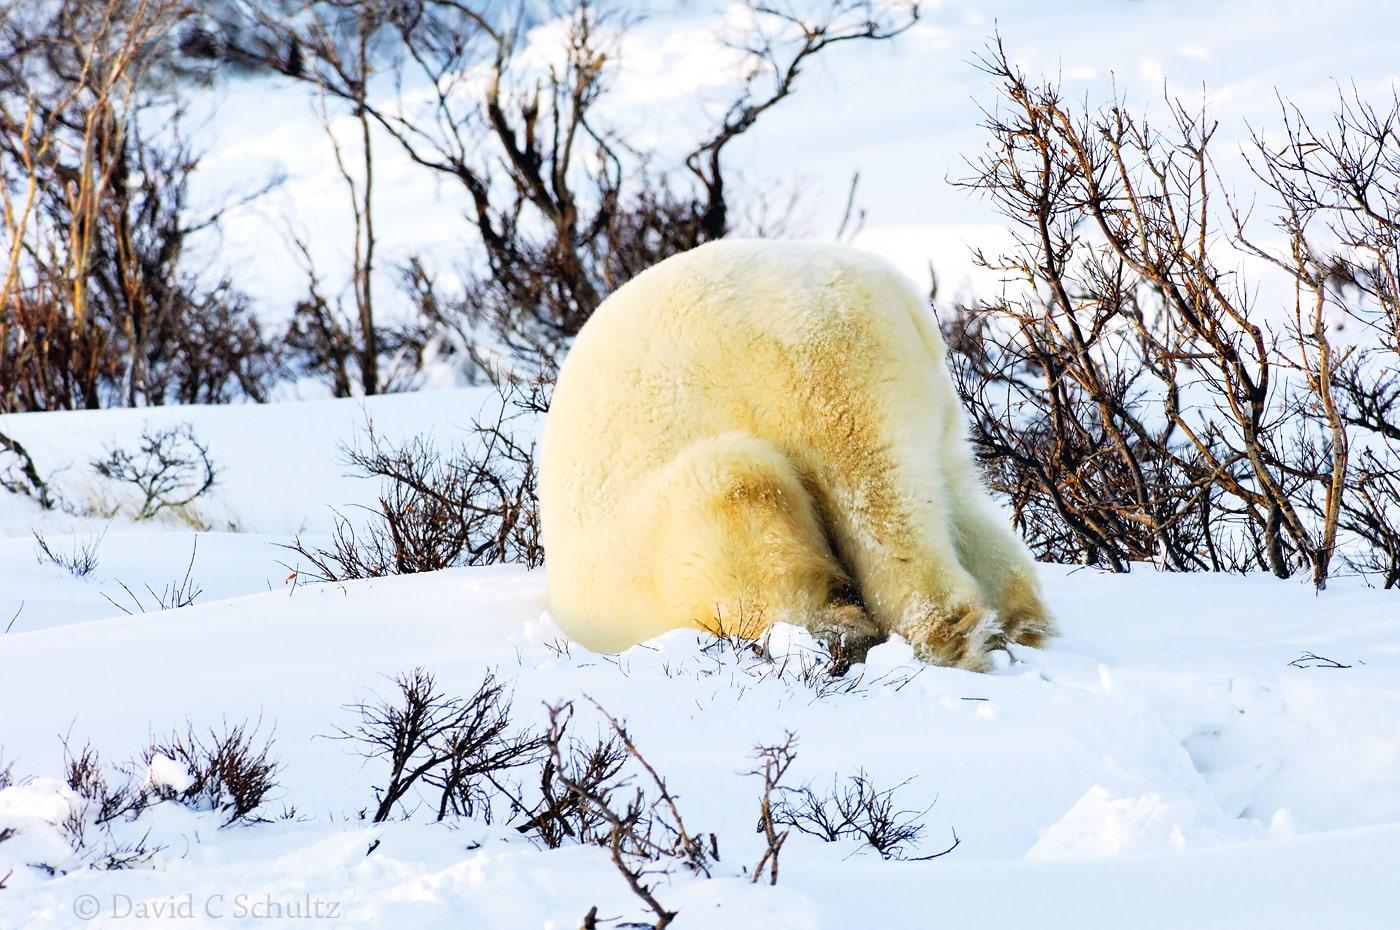 Polar bear, Canada - Image #168-508